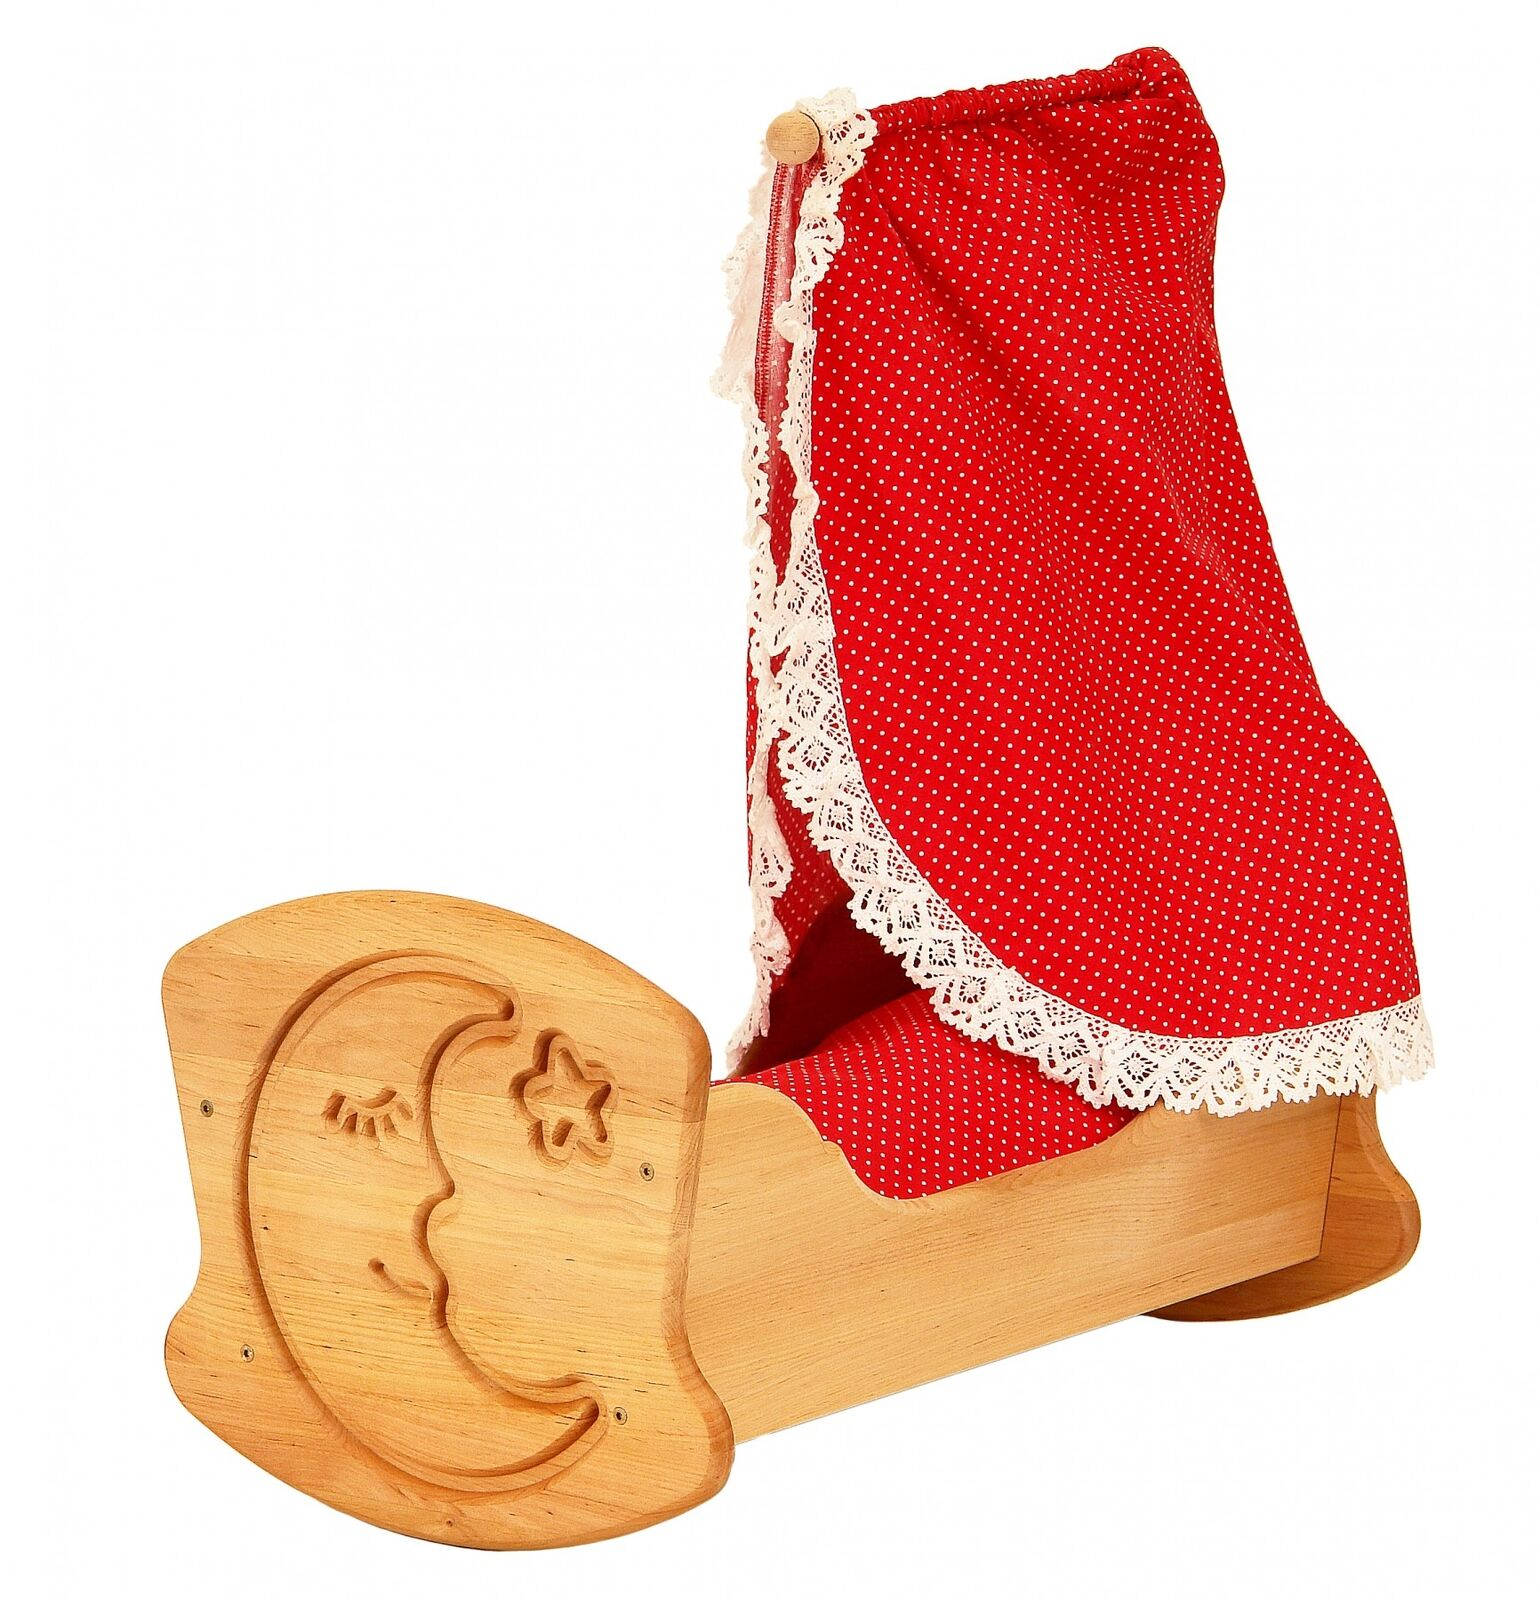 Drewart Puppenwiege Puppenbett Holzbett mit Bettzeug aus Erlenholz 933 933 933 3072 de89a3